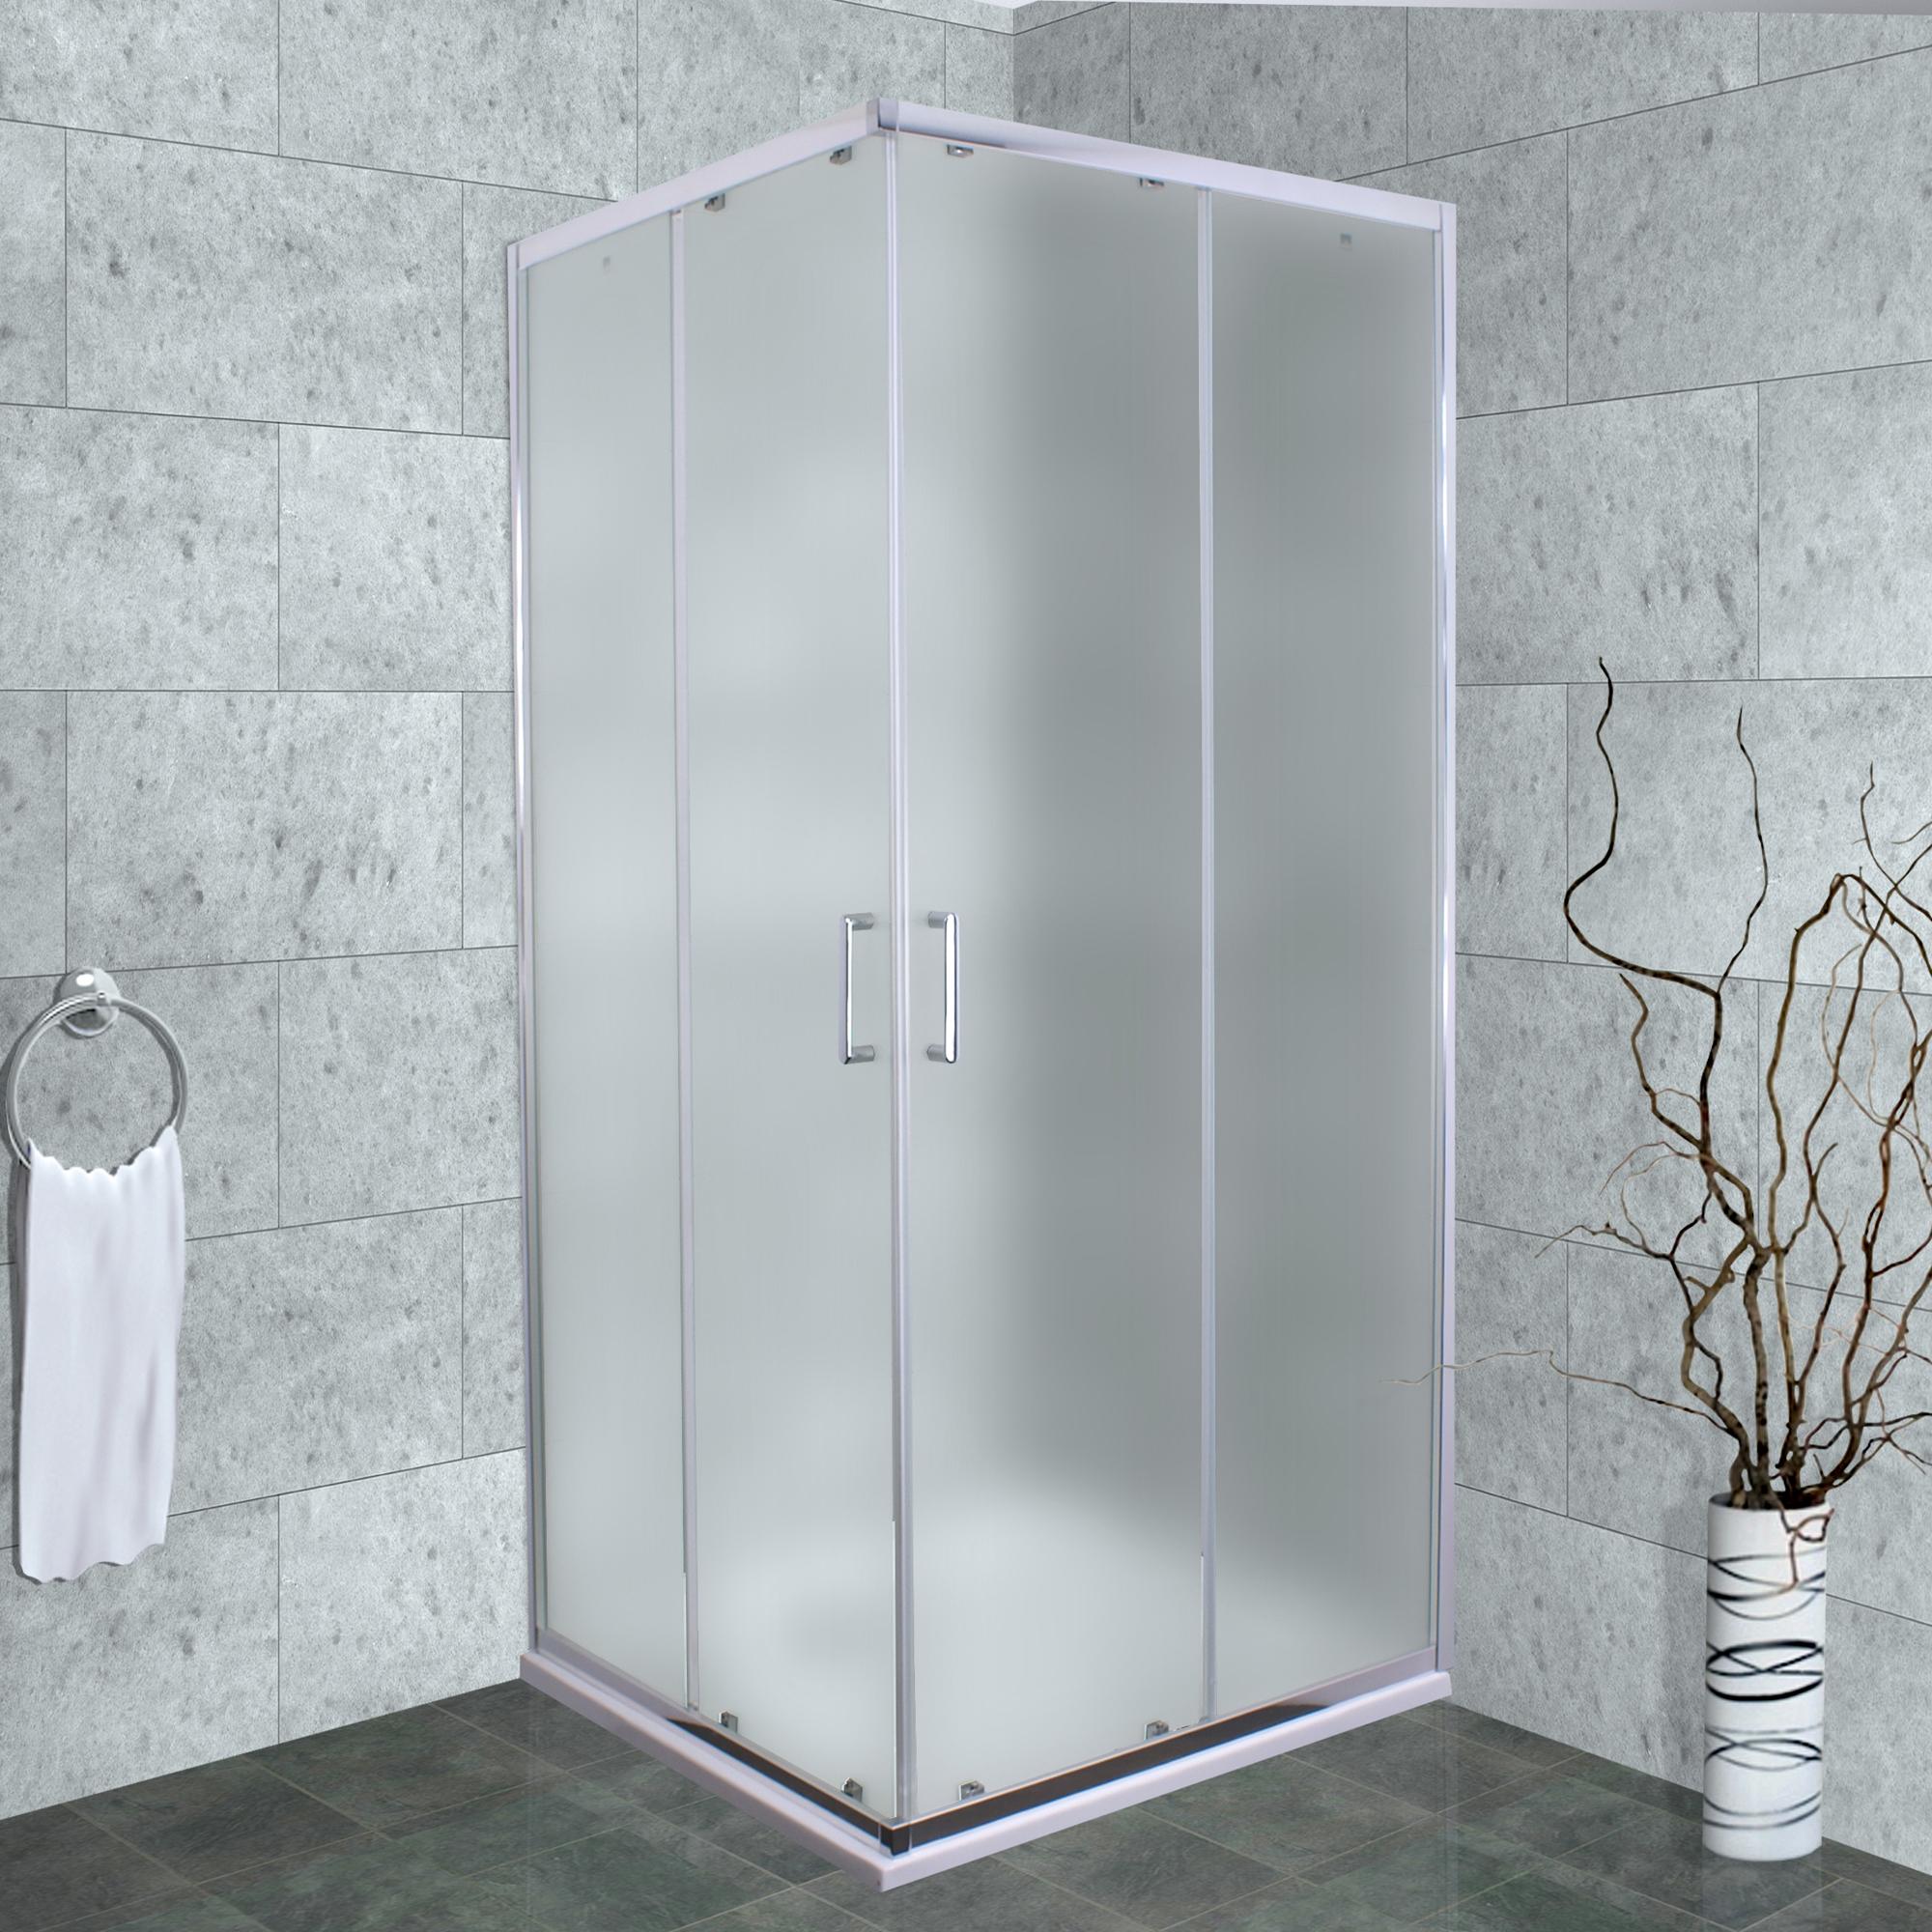 Душевой уголок Timo Altti 619 Foggy Glass без поддона душевой уголок timo altti душевой угол 619 clean glass 90 90 190